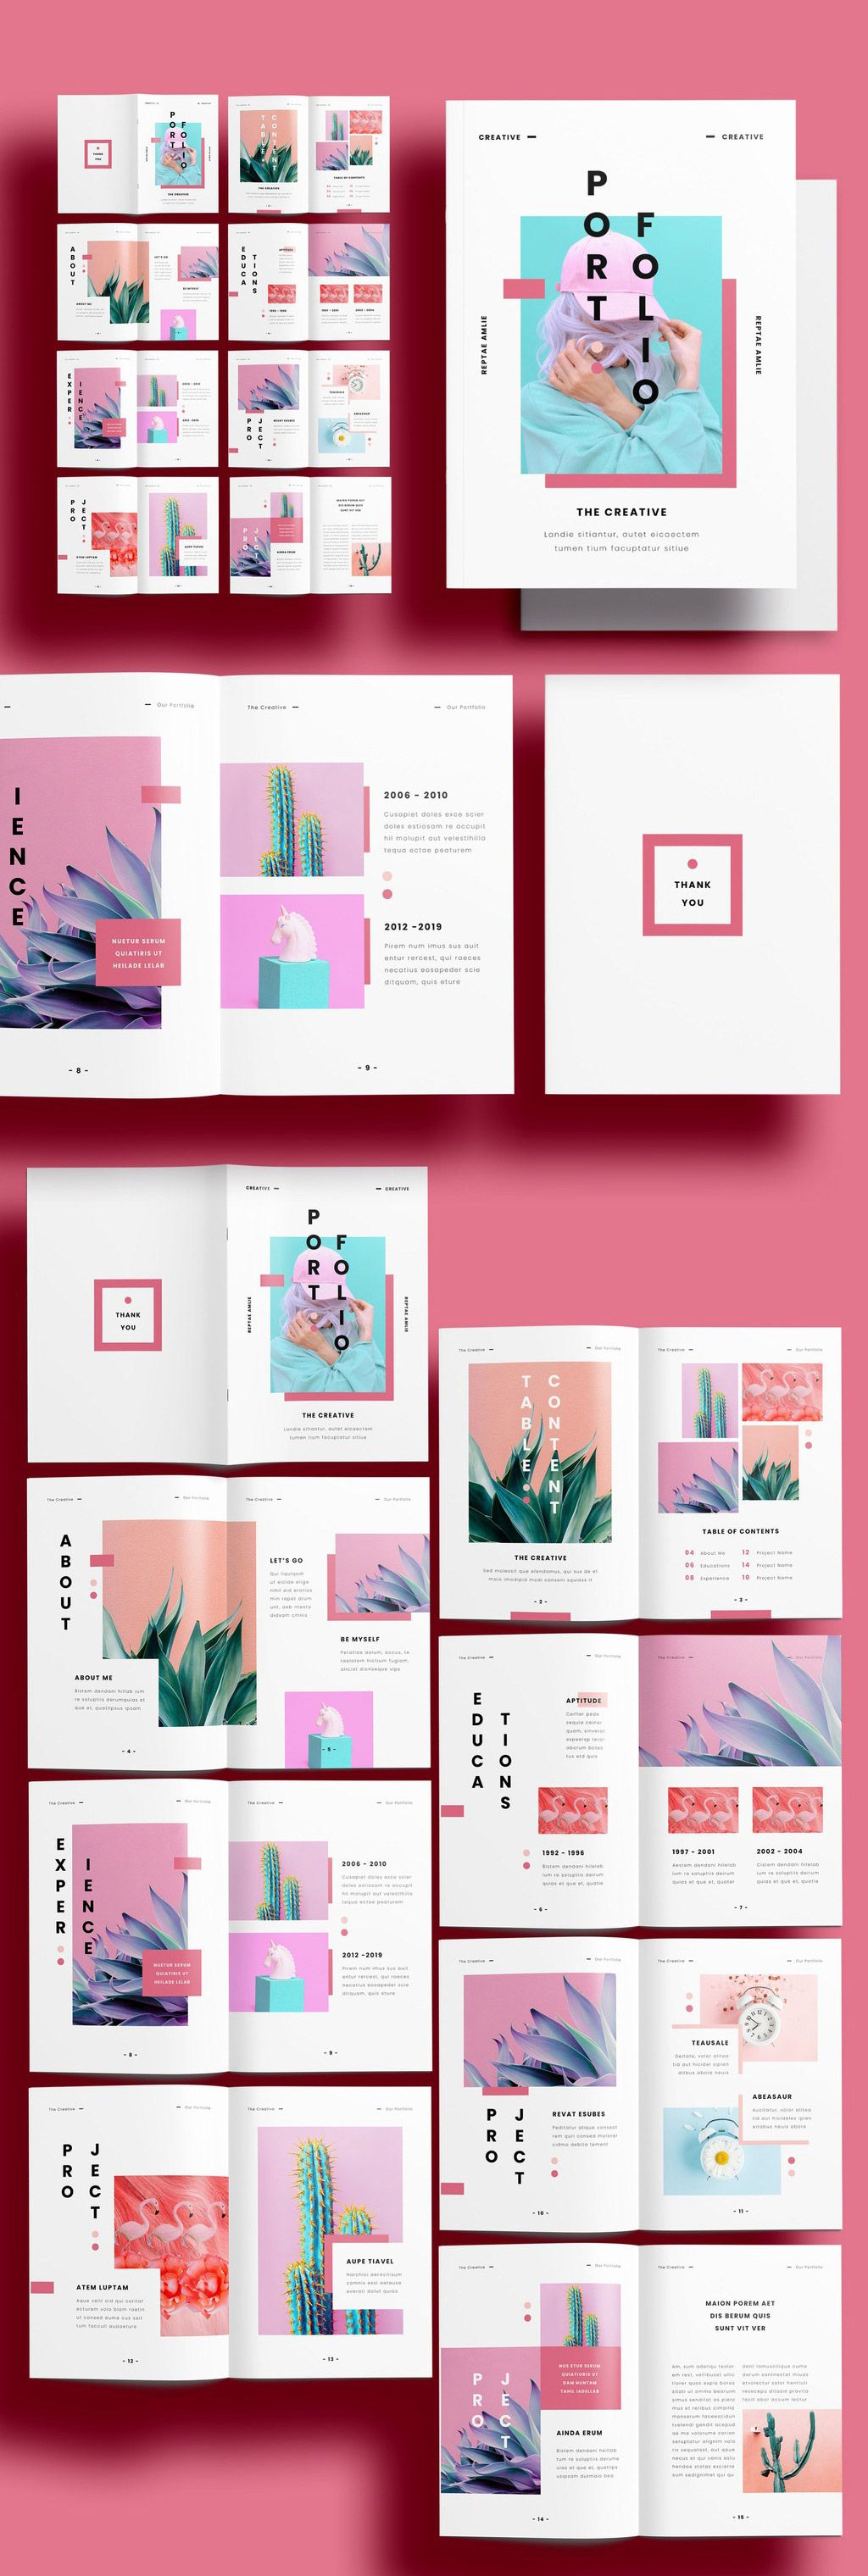 A Unique Portfolio Template for Adobe InDesign